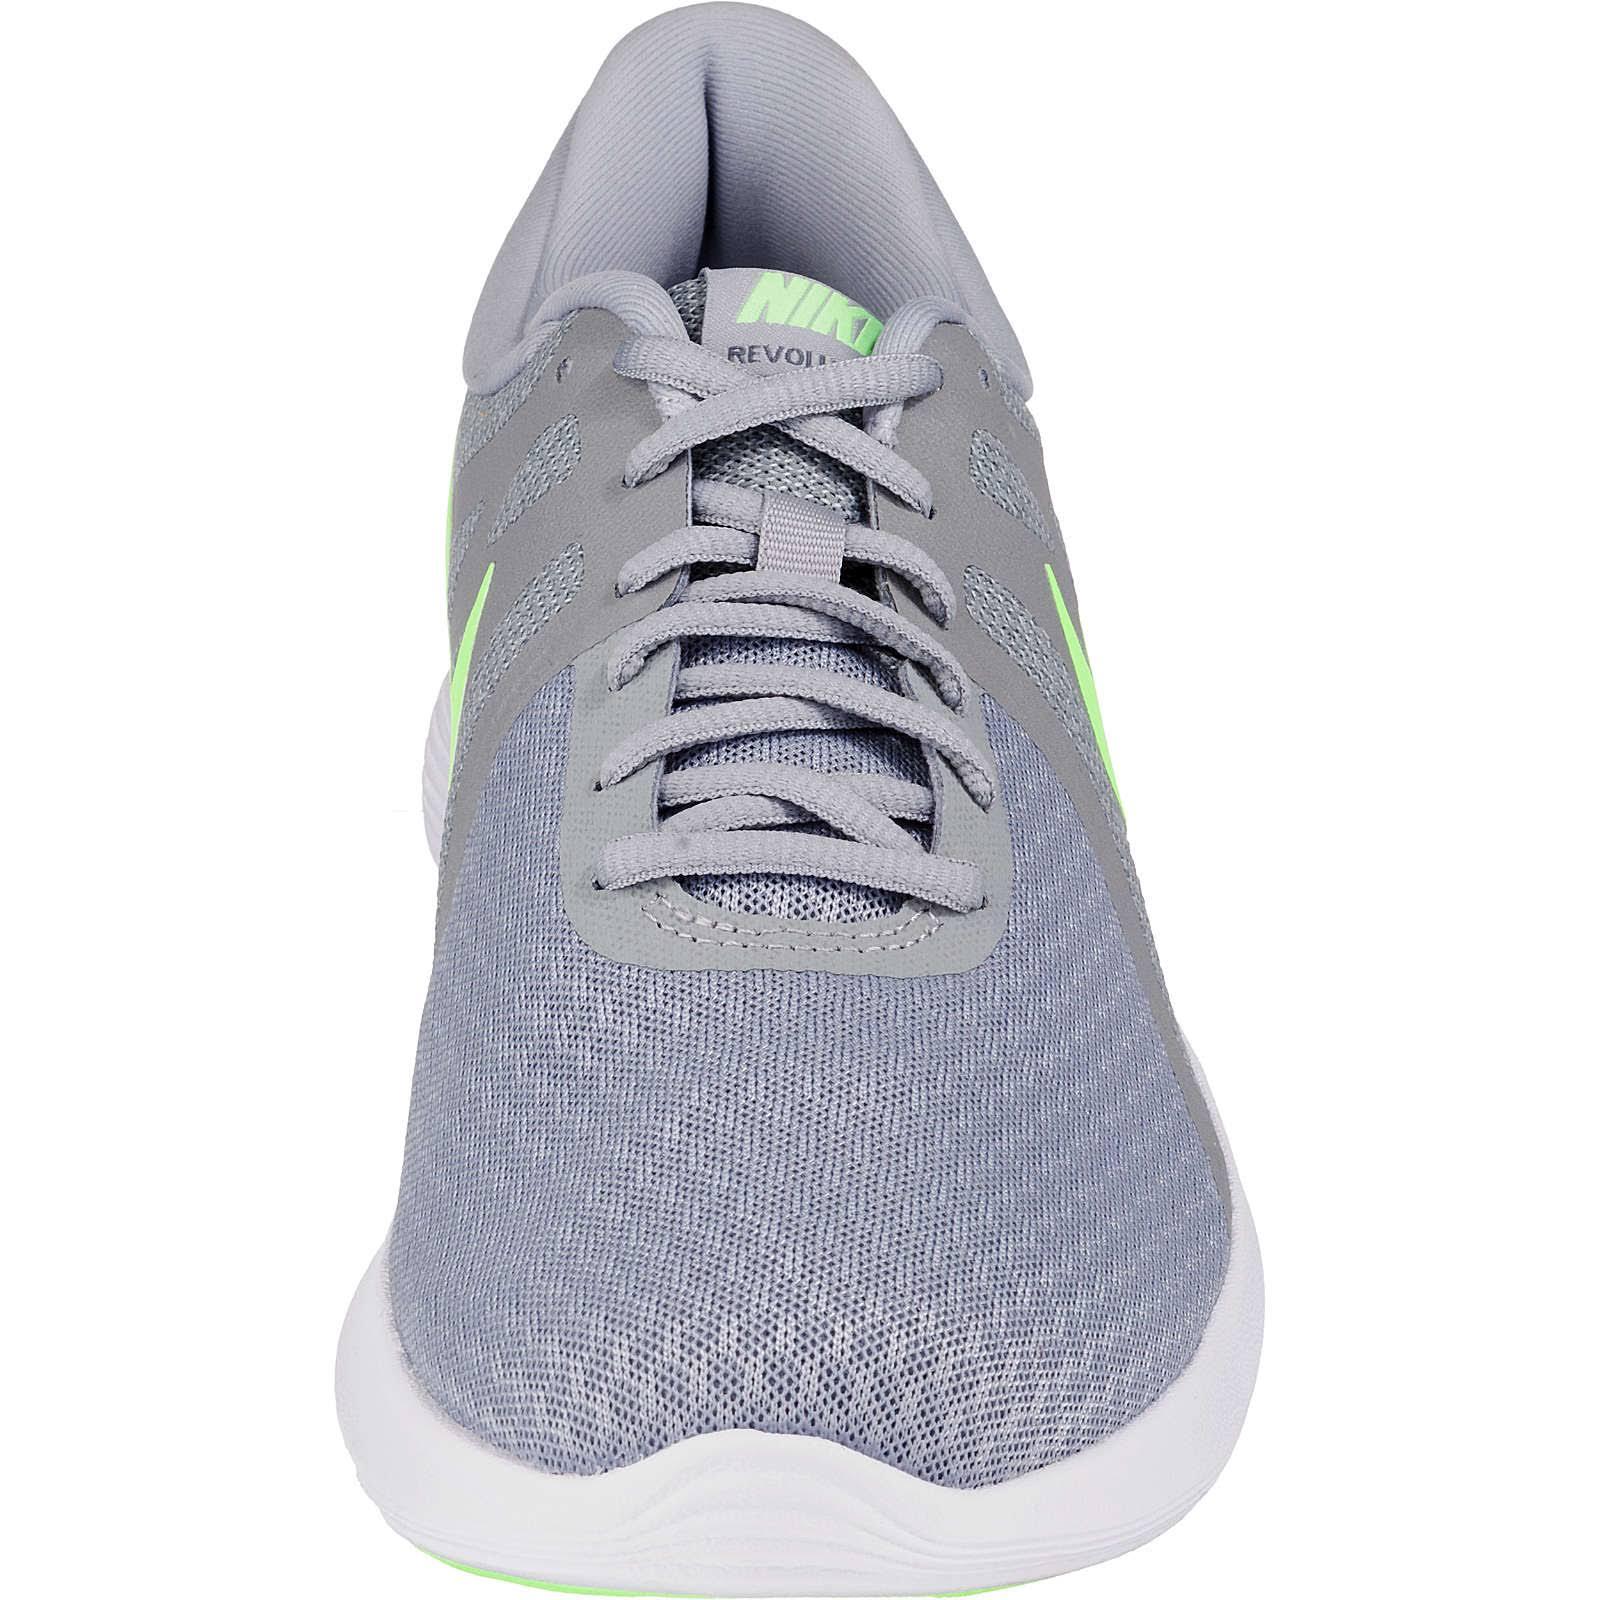 Herren Gr Performance Revolution kombi Grau 4 Laufschuhe Grau blau Nike grün 40 6FUpwqYw